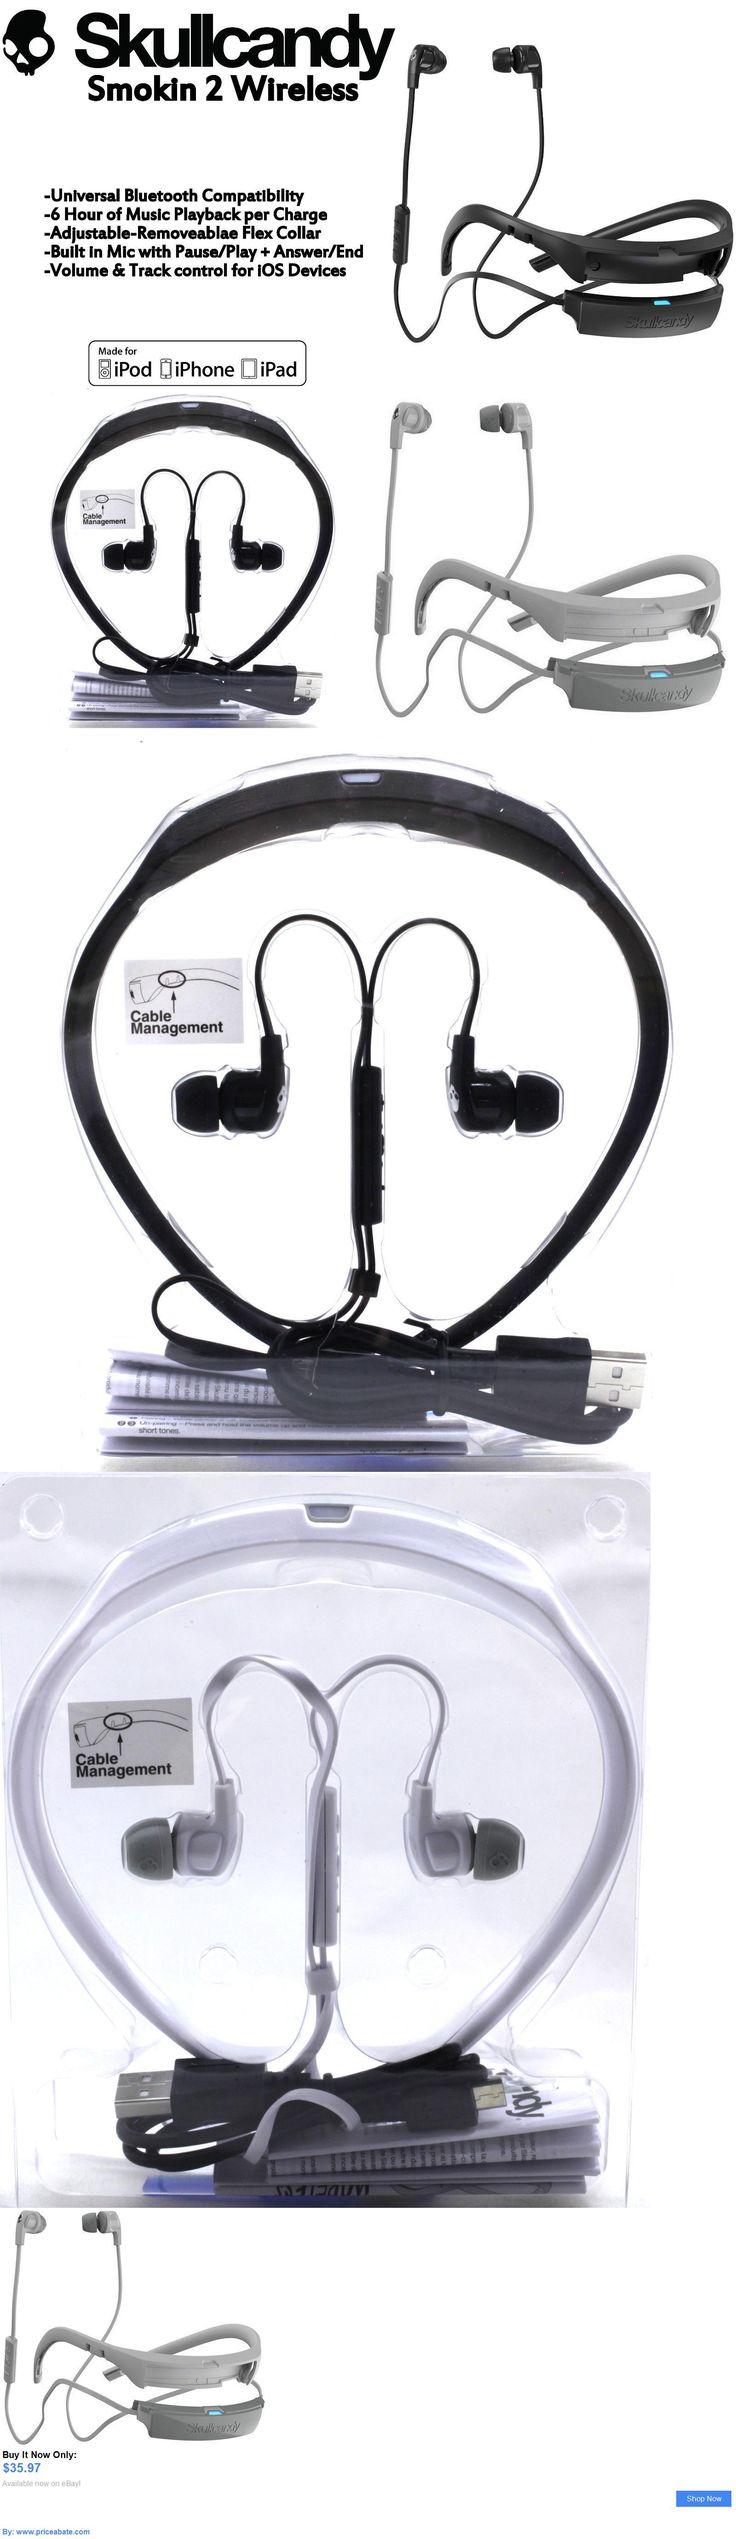 electronics: New Skullcandy Smokin Buds 2 Wireless Bluetooth Earphones With Mic Black White BUY IT NOW ONLY: $35.97 #priceabateelectronics OR #priceabate